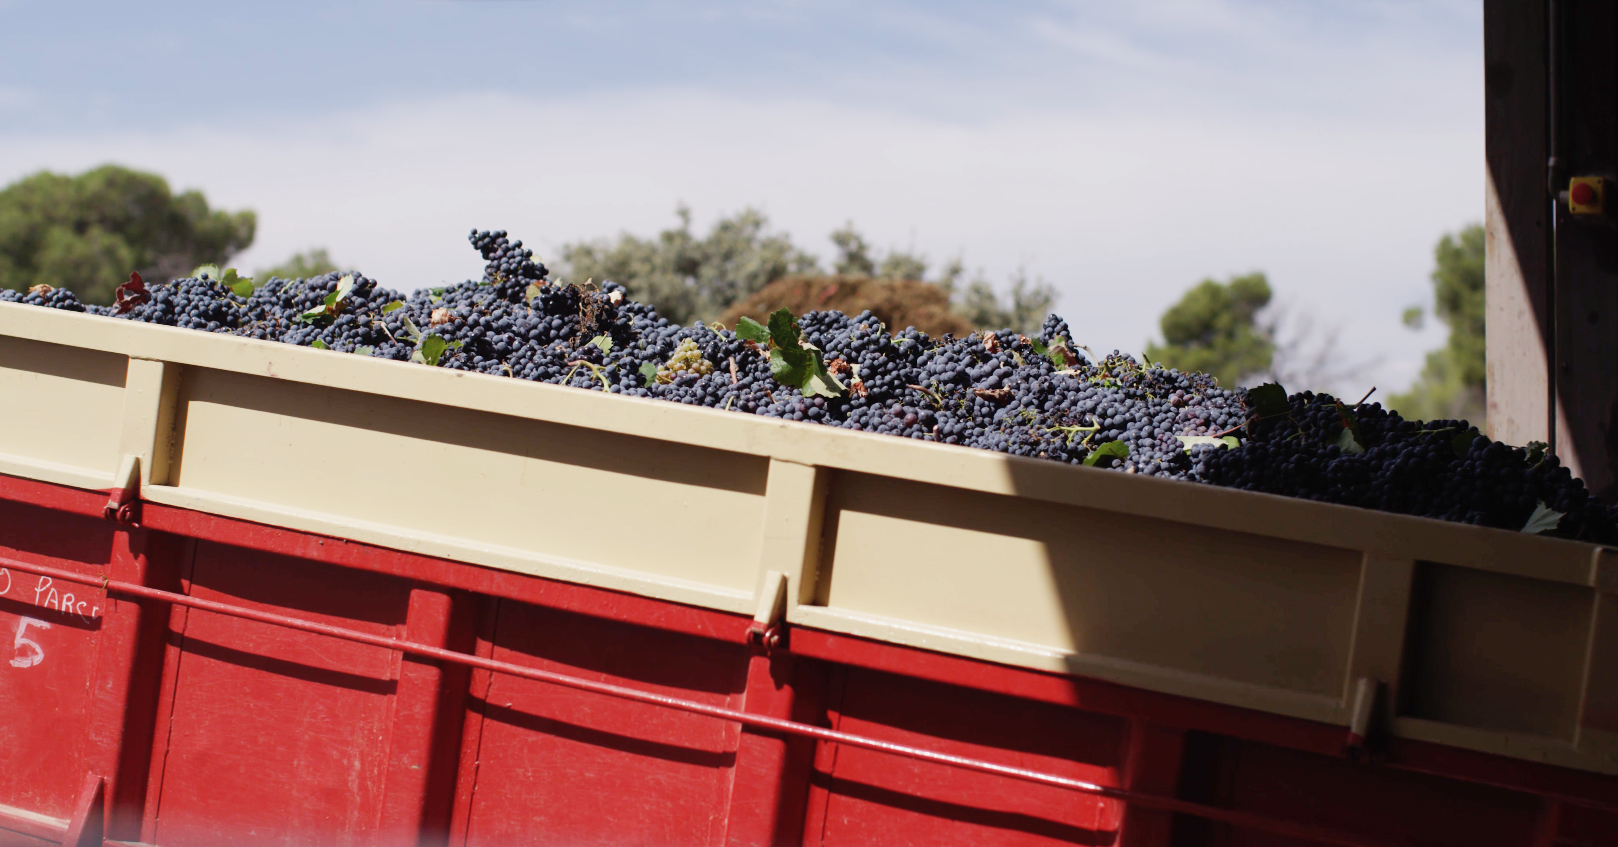 benoit-valerie-calvet-toro-loco-wine-05